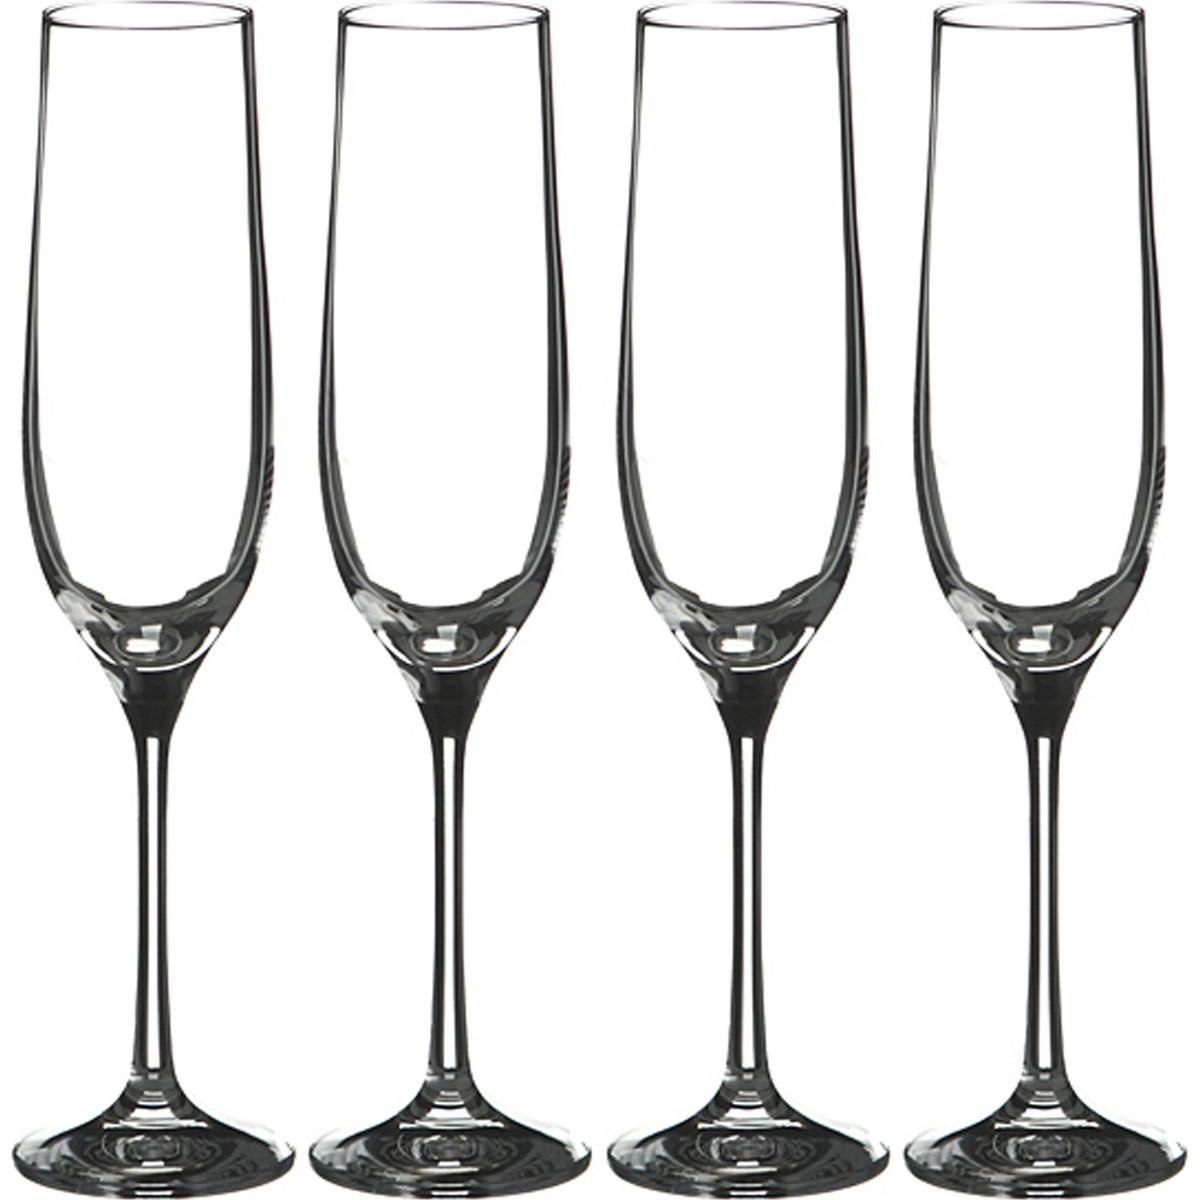 {} Bohemia Crystal Набор бокалов для шампанского Cora  (24 см - 4 шт) набор для кофе crystal bohemia mokko 4 предмета